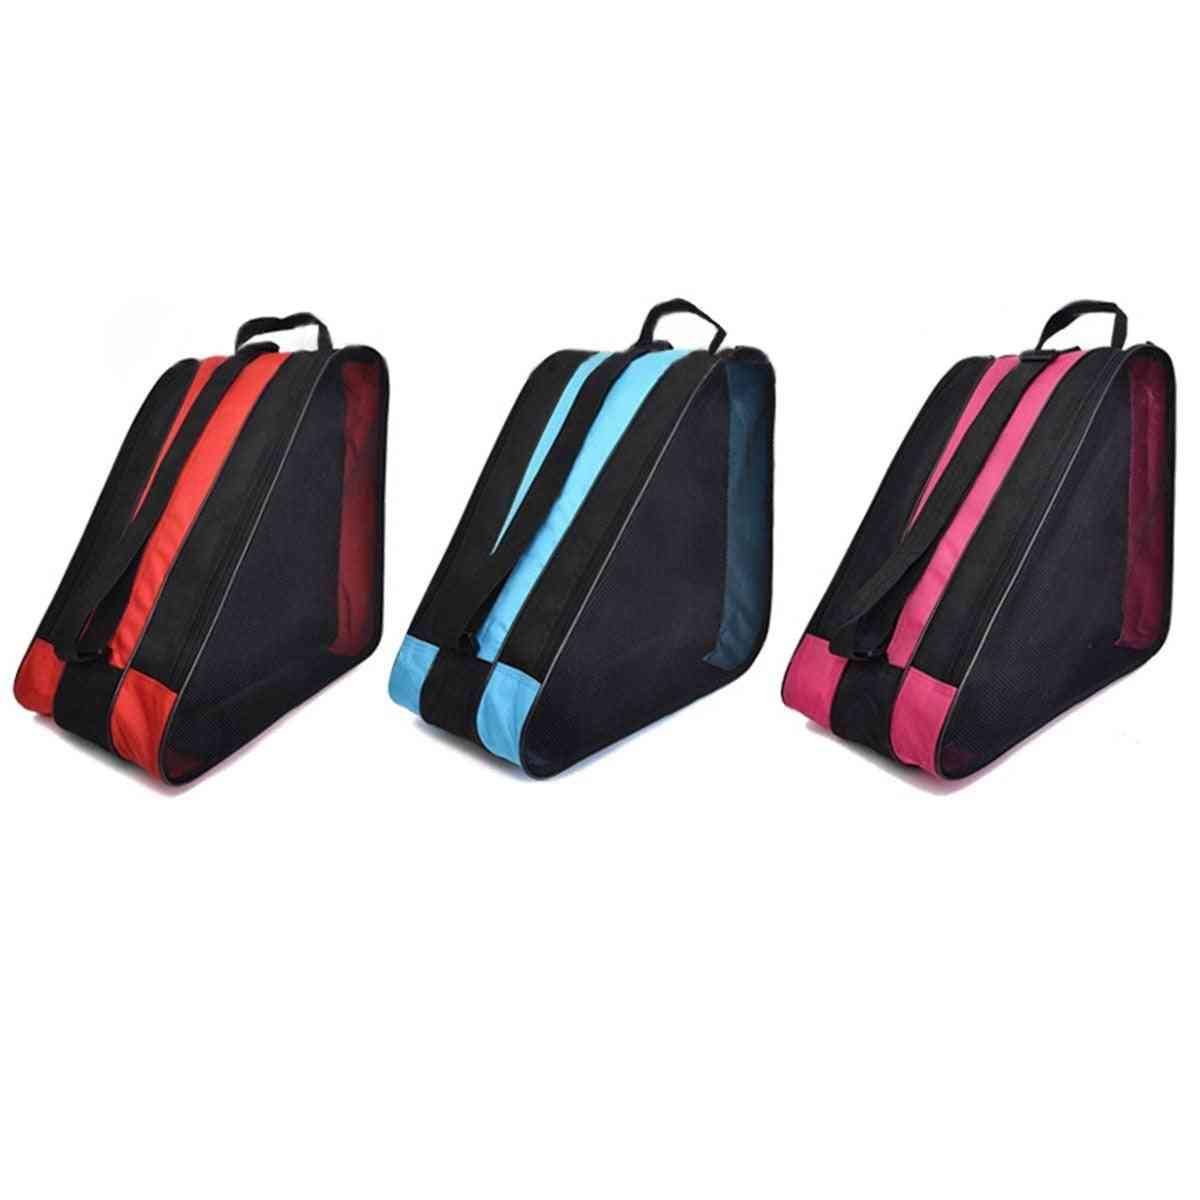 Roller Skate Carry Bag